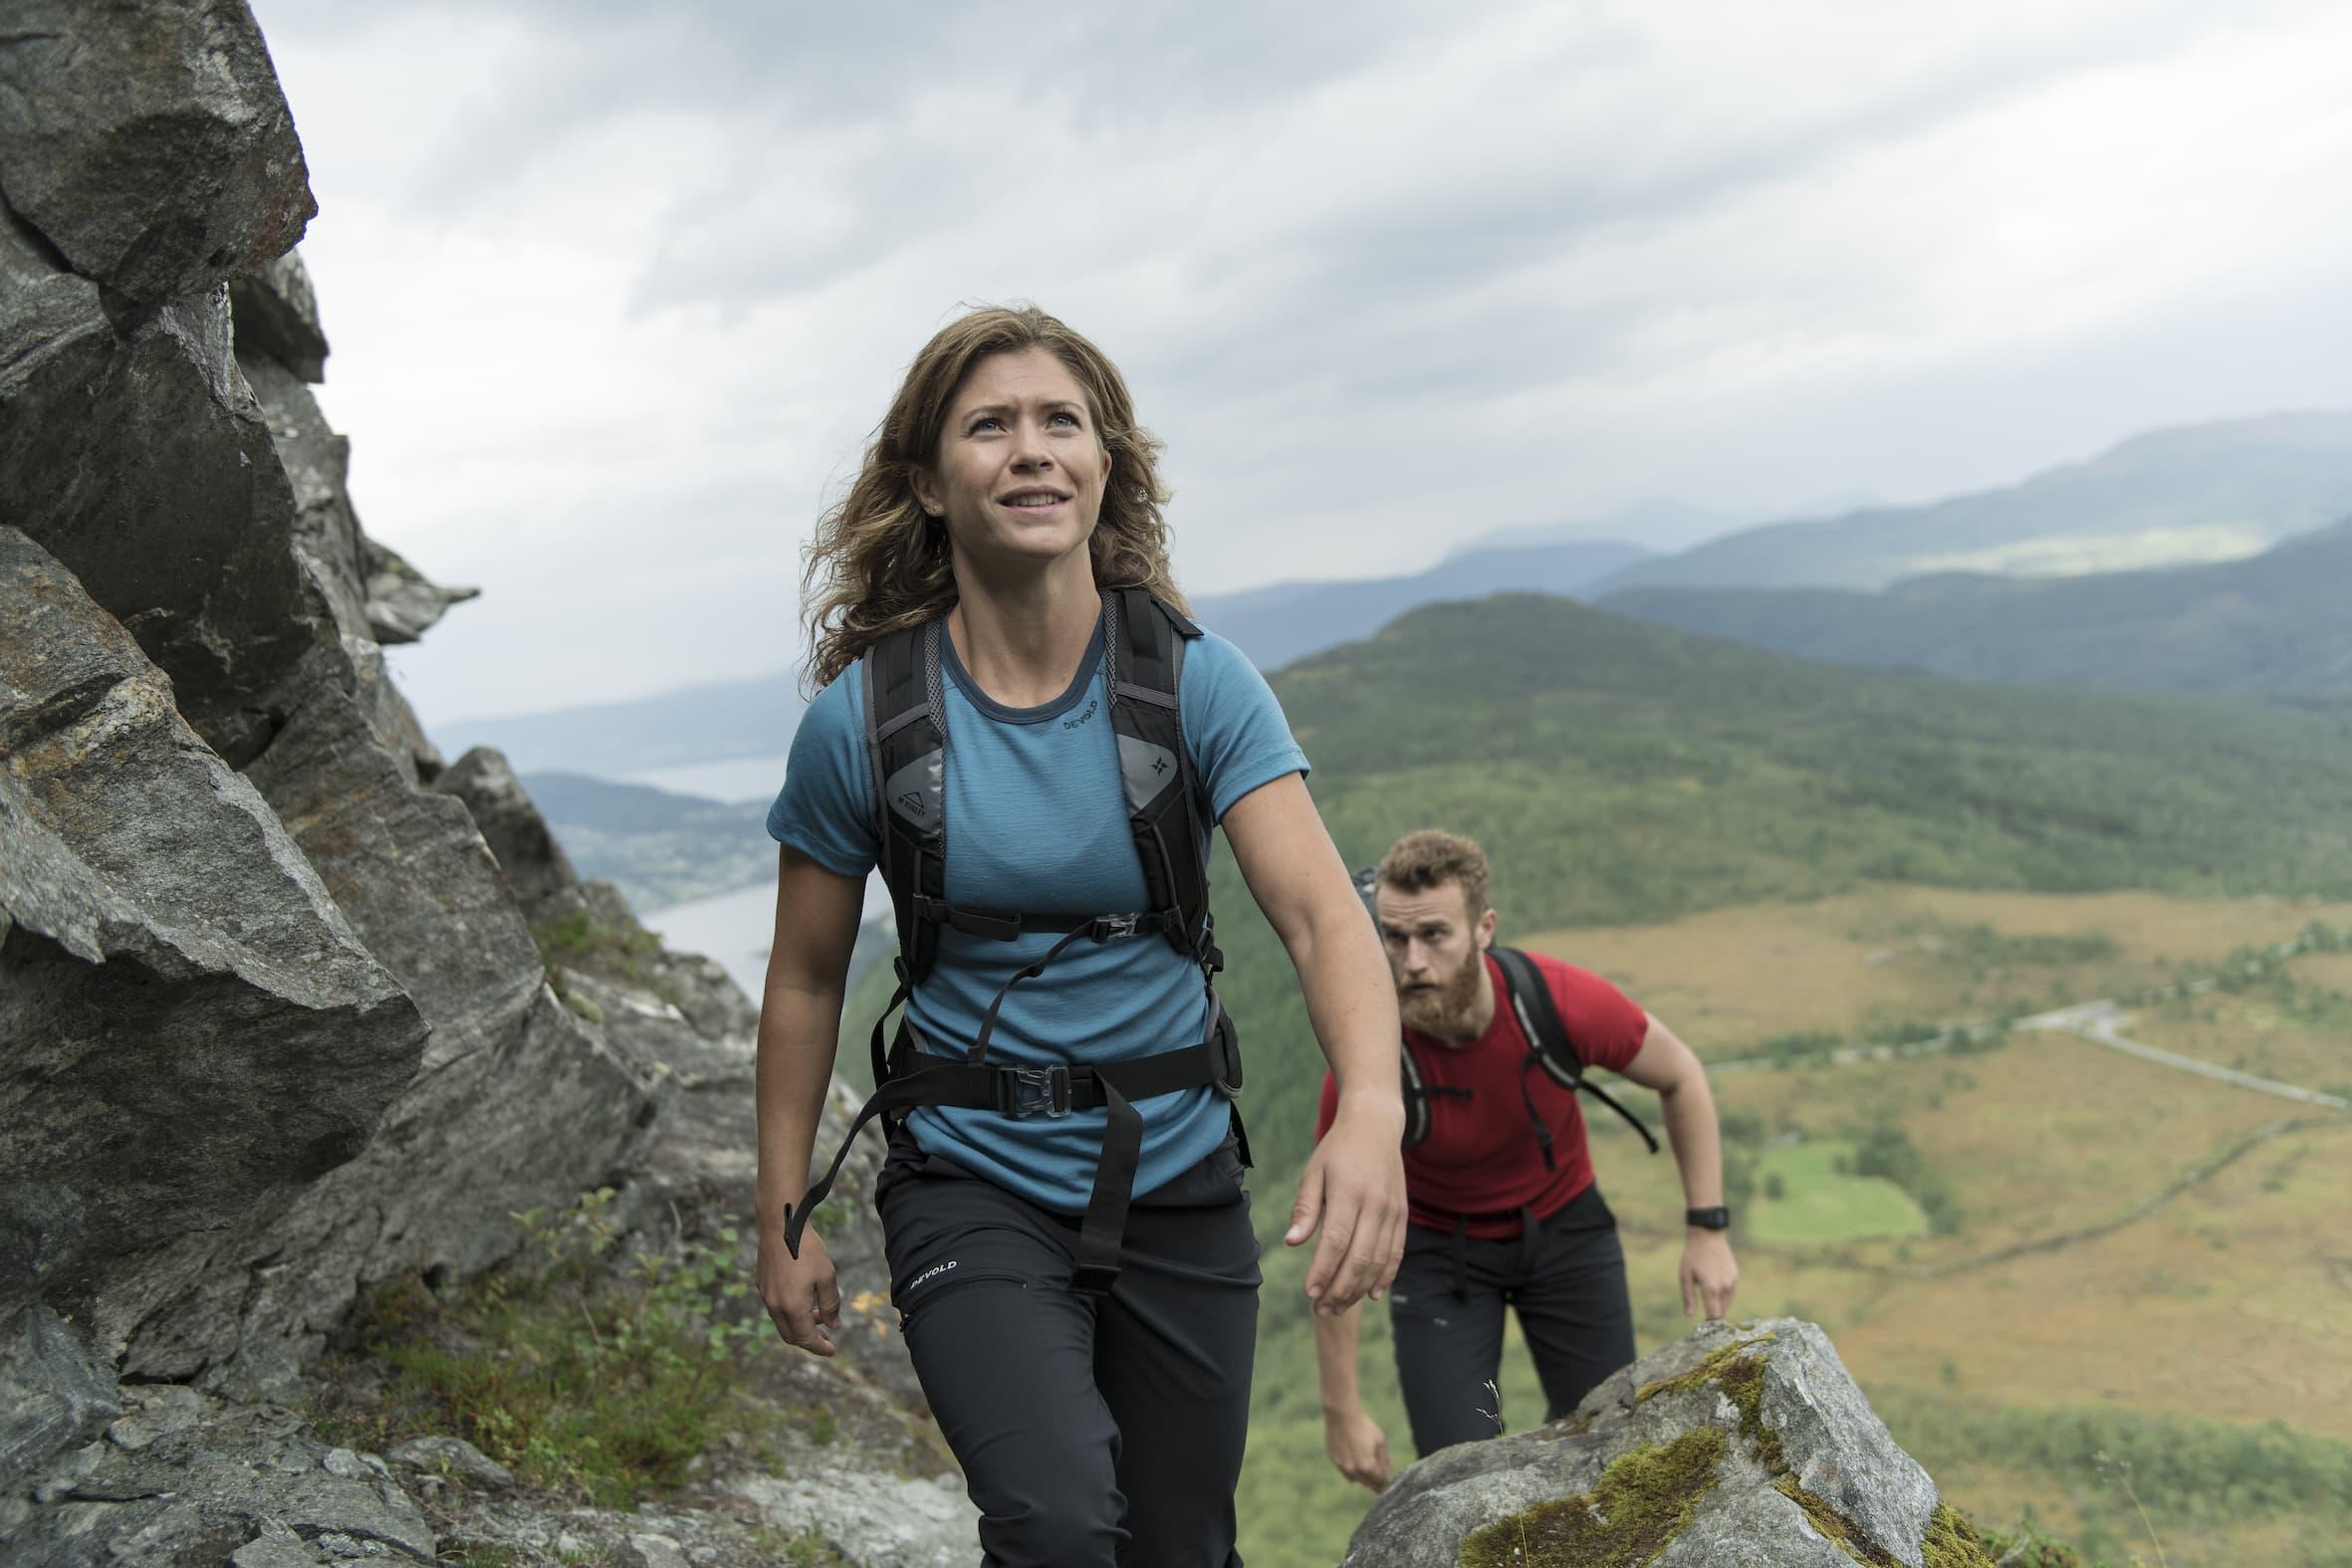 Wanderhose Devold Heroy zum Bergsteigen